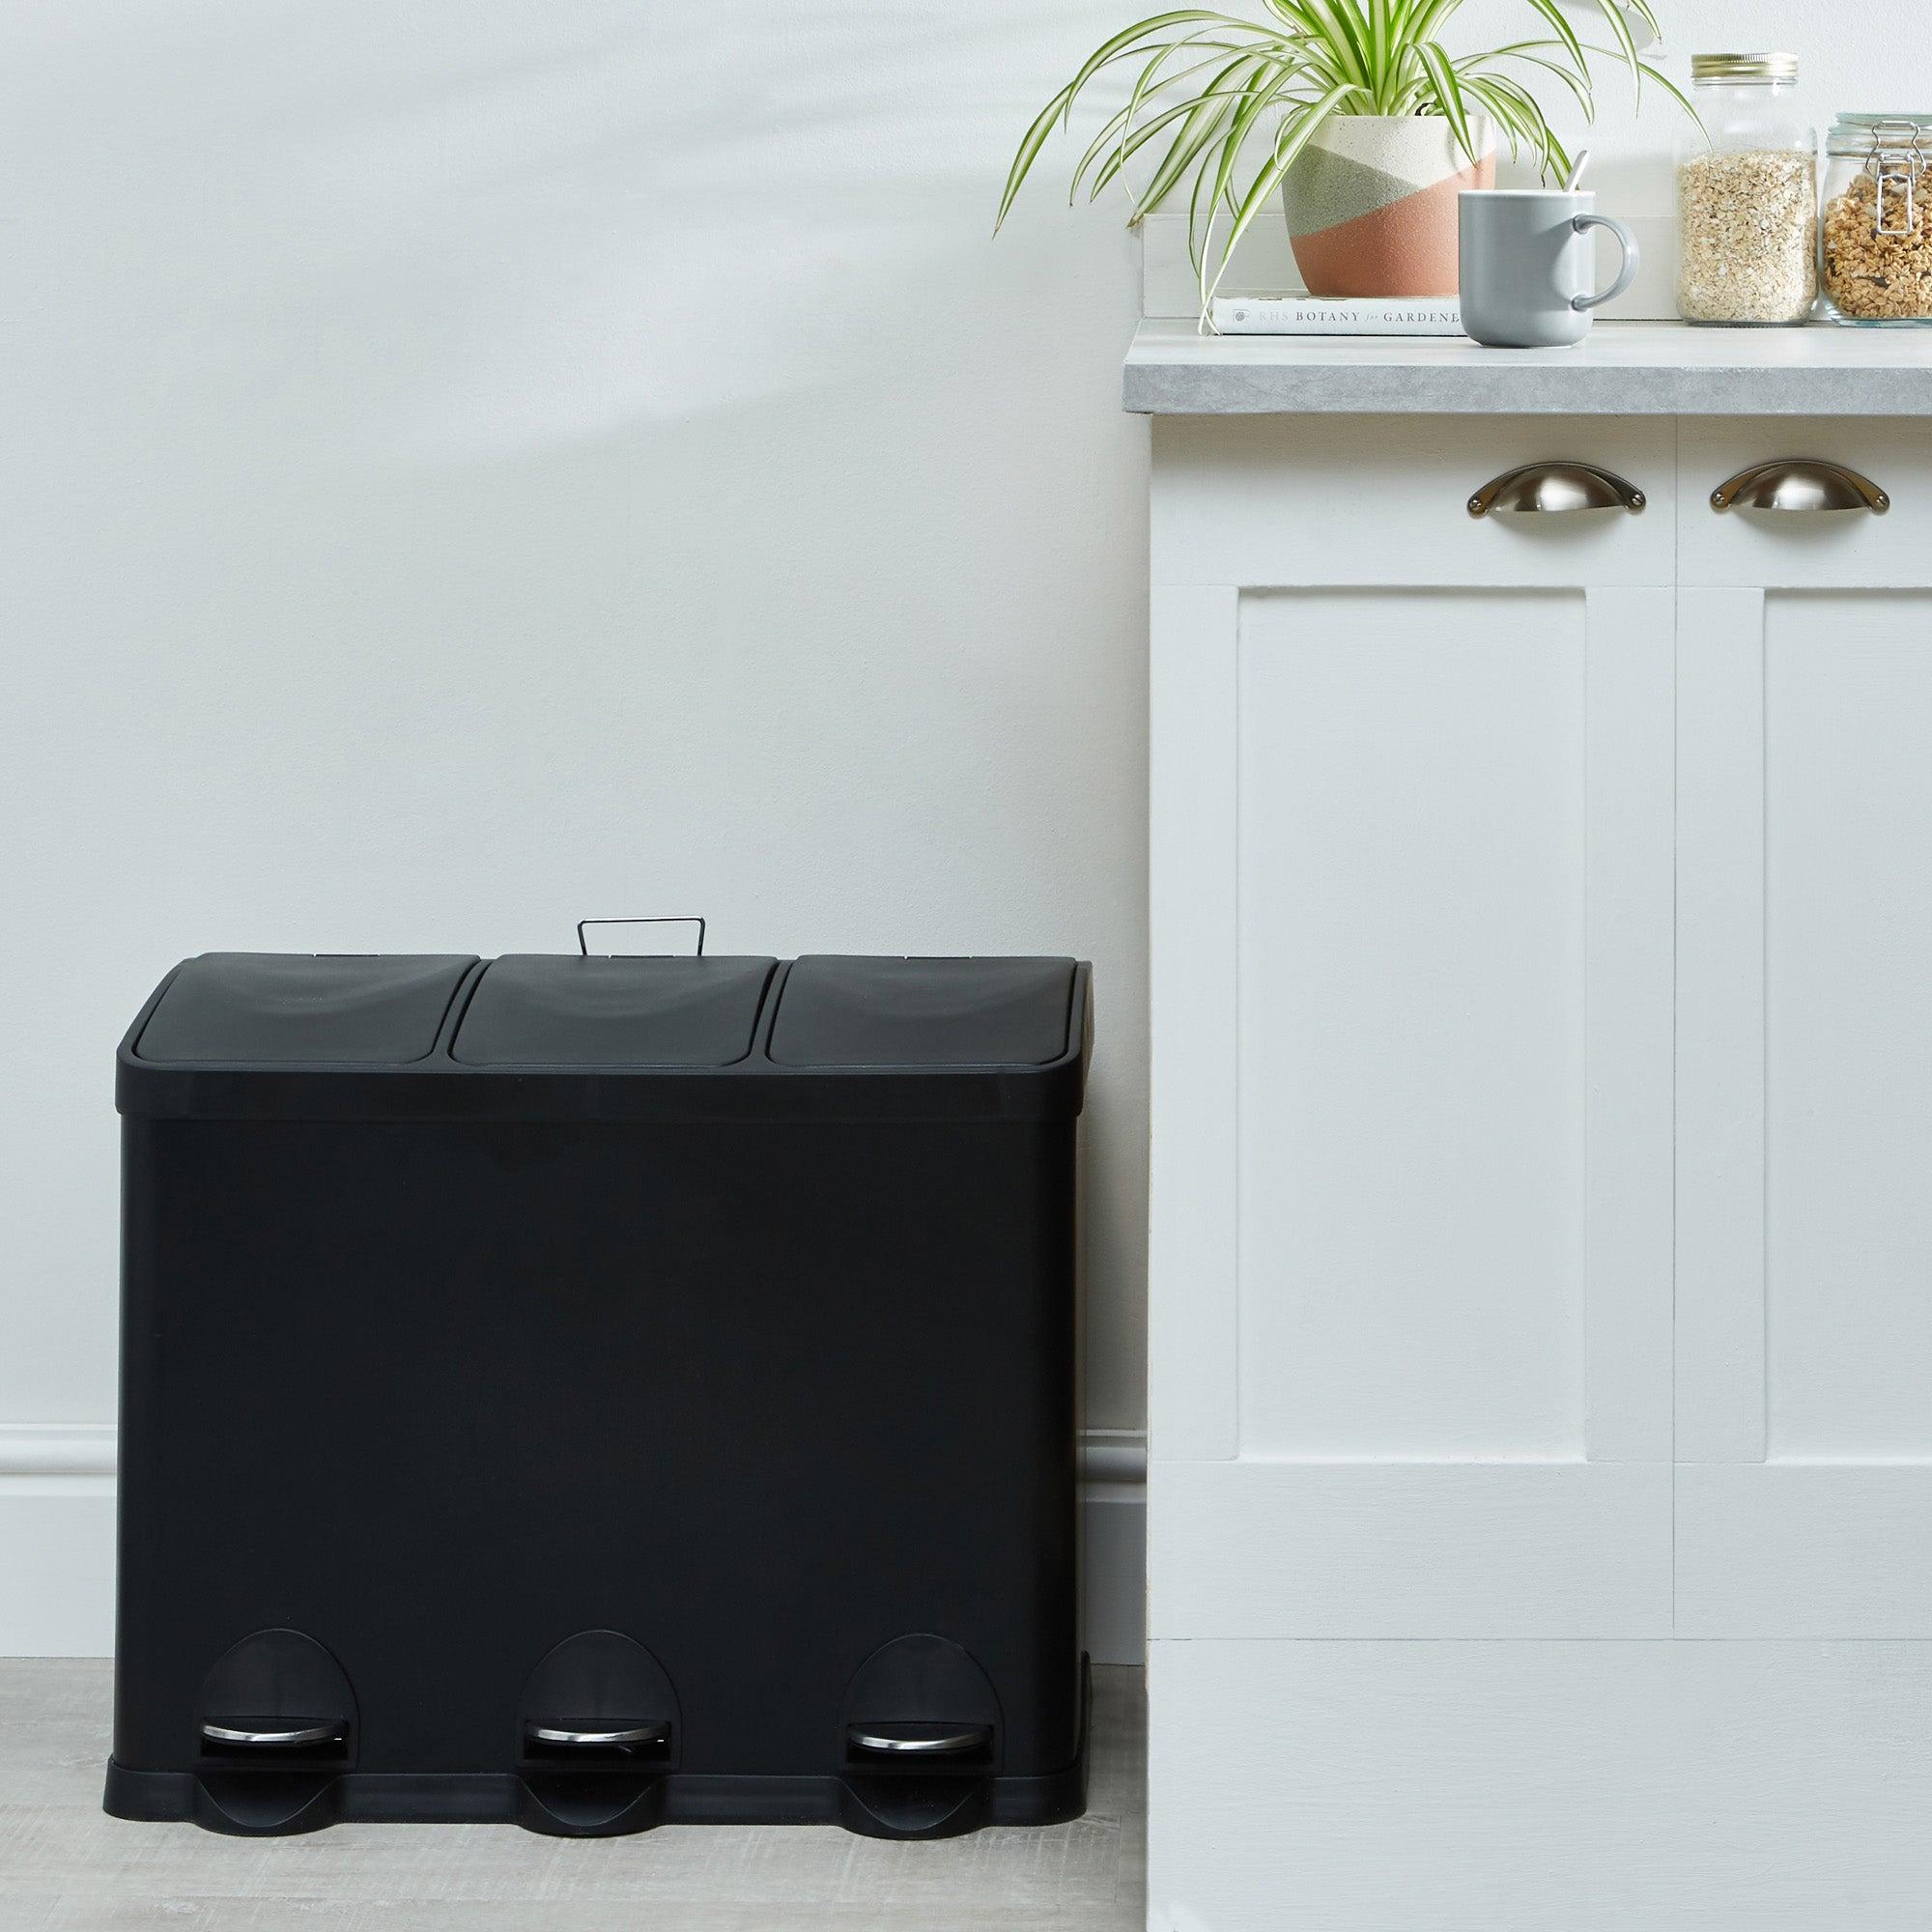 45L Low Recycling Bin Black